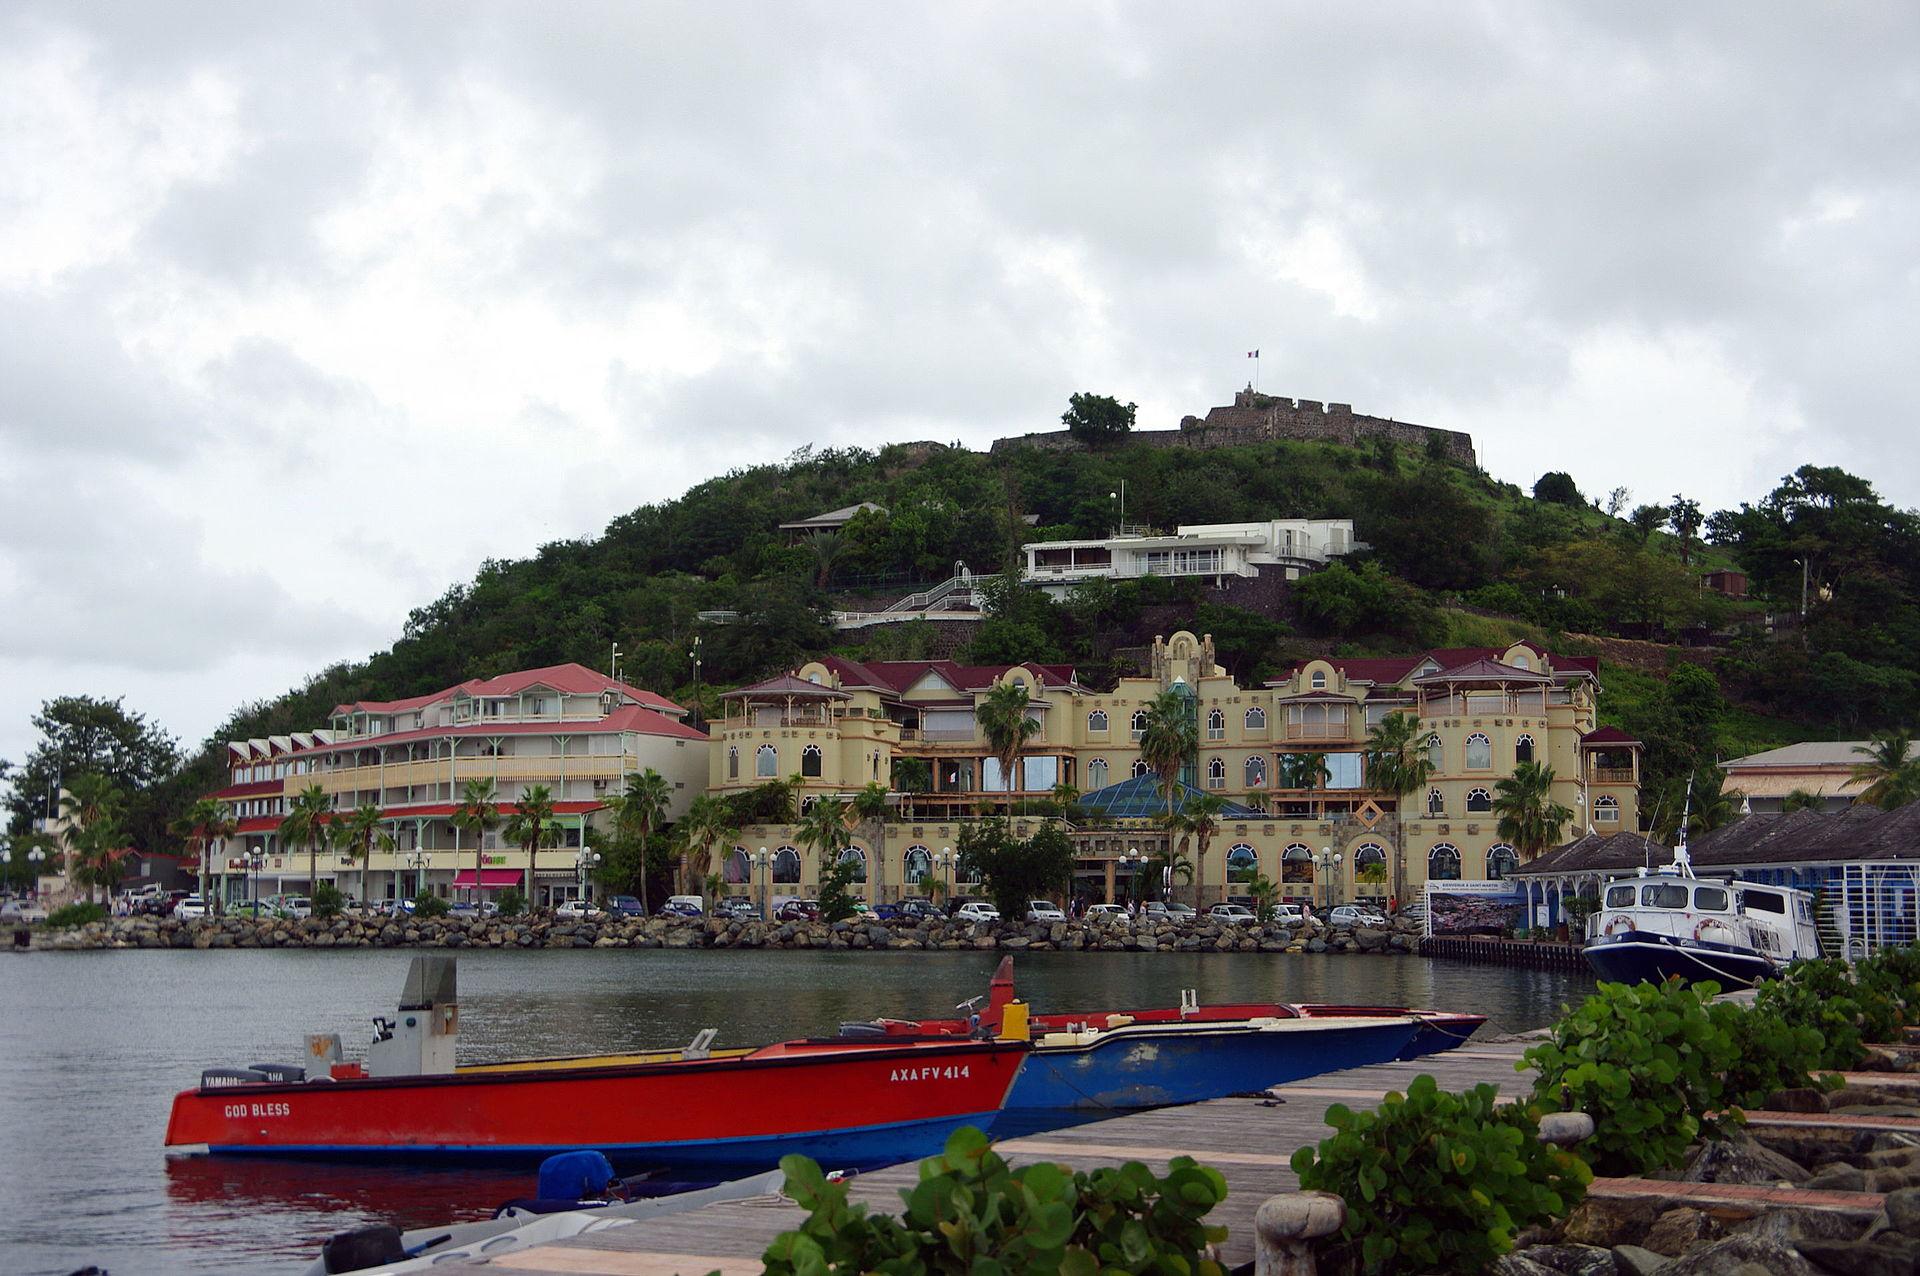 Marigot saint martin reisef hrer auf wikivoyage - Marina port la royale marigot st martin ...